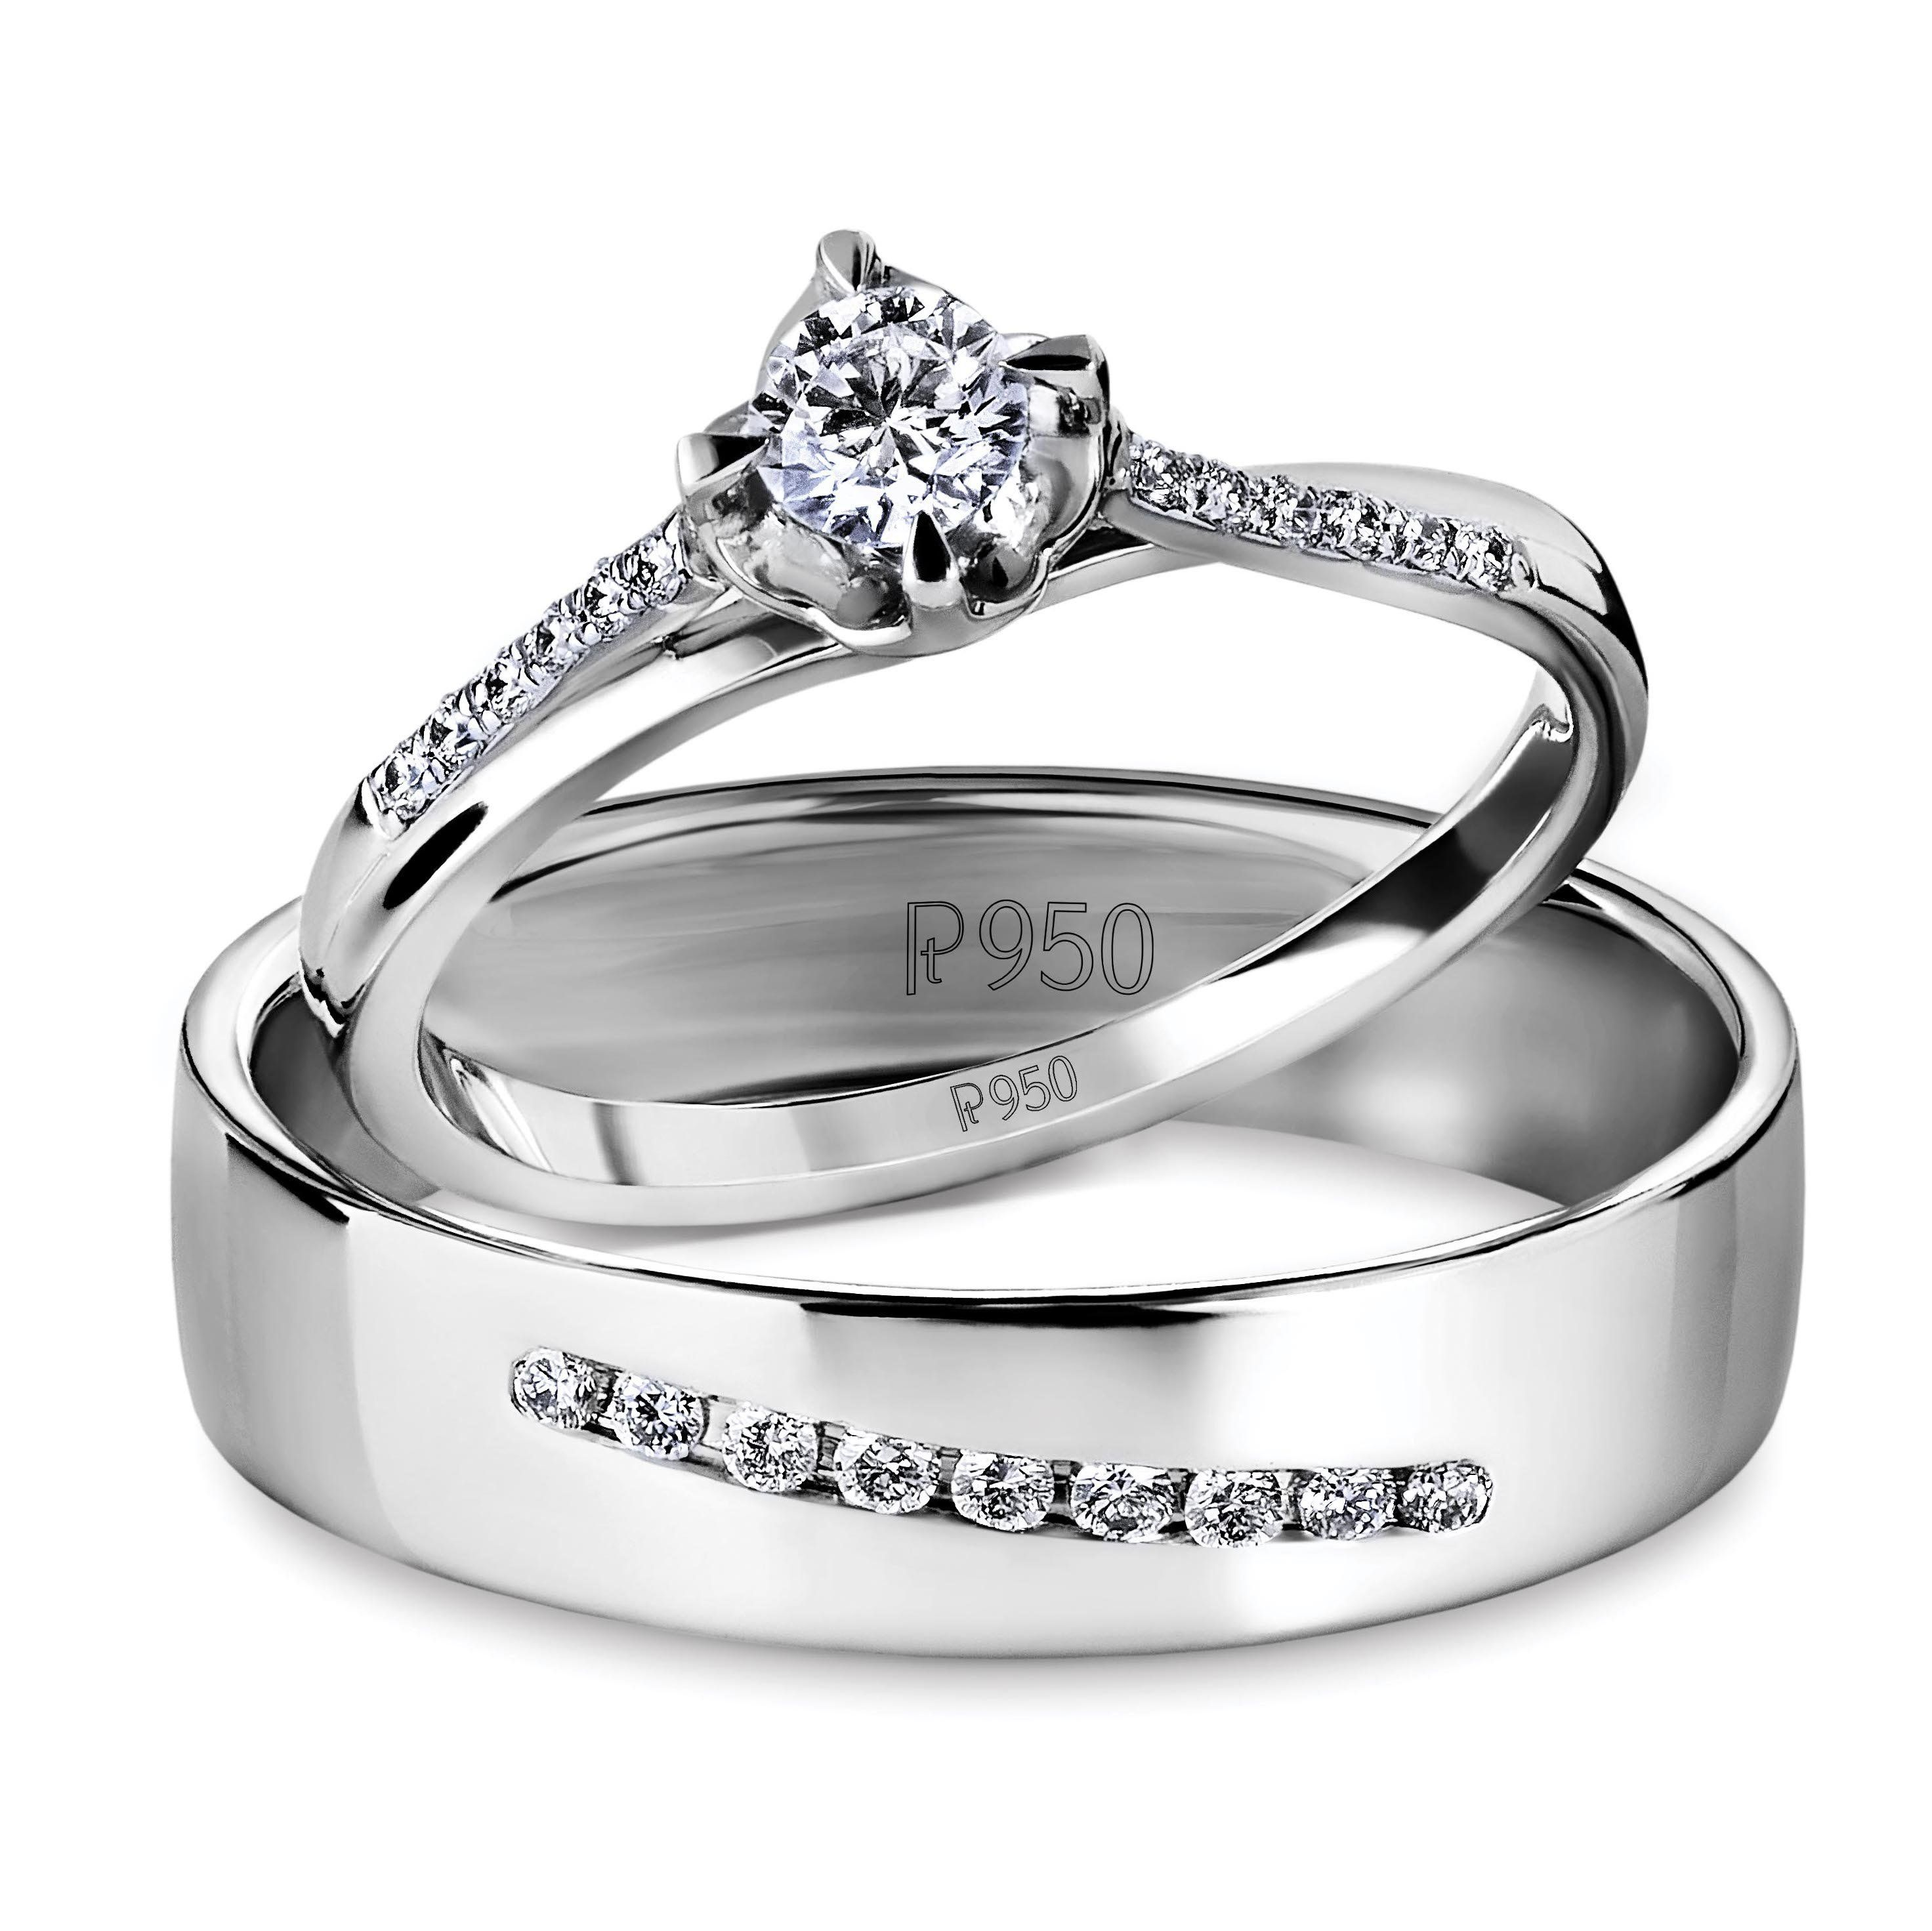 Designer Platinum Love Bands with Diamonds JL PT 597